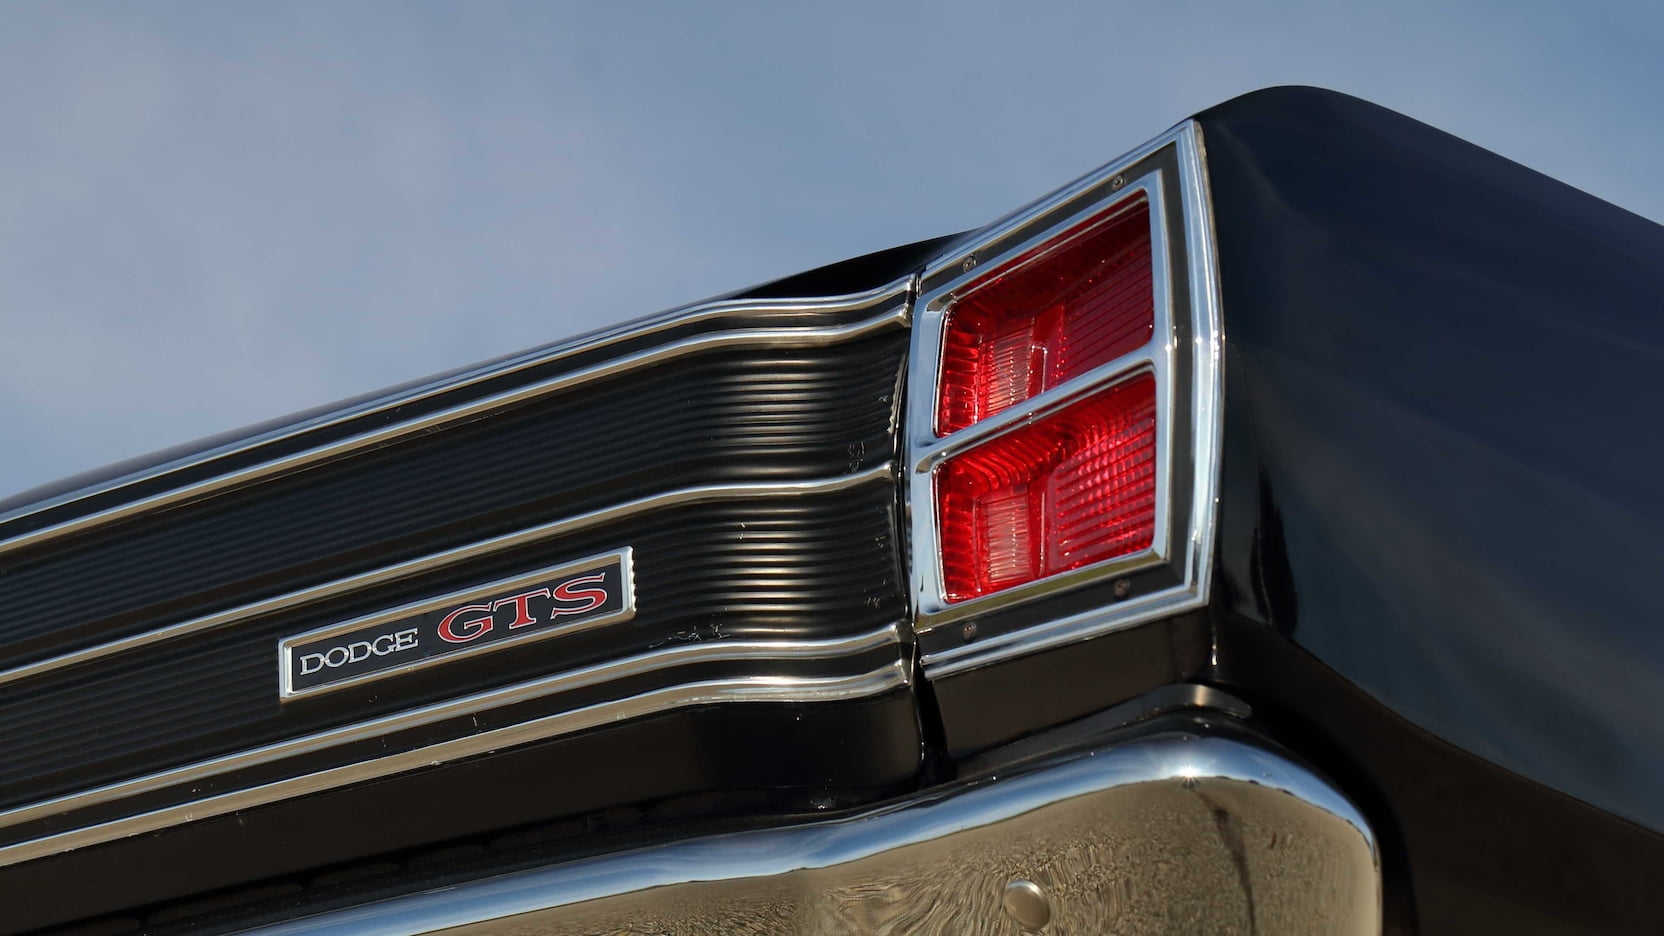 1969 Dodge Dart GTS Rear Taillight and GTS Badge